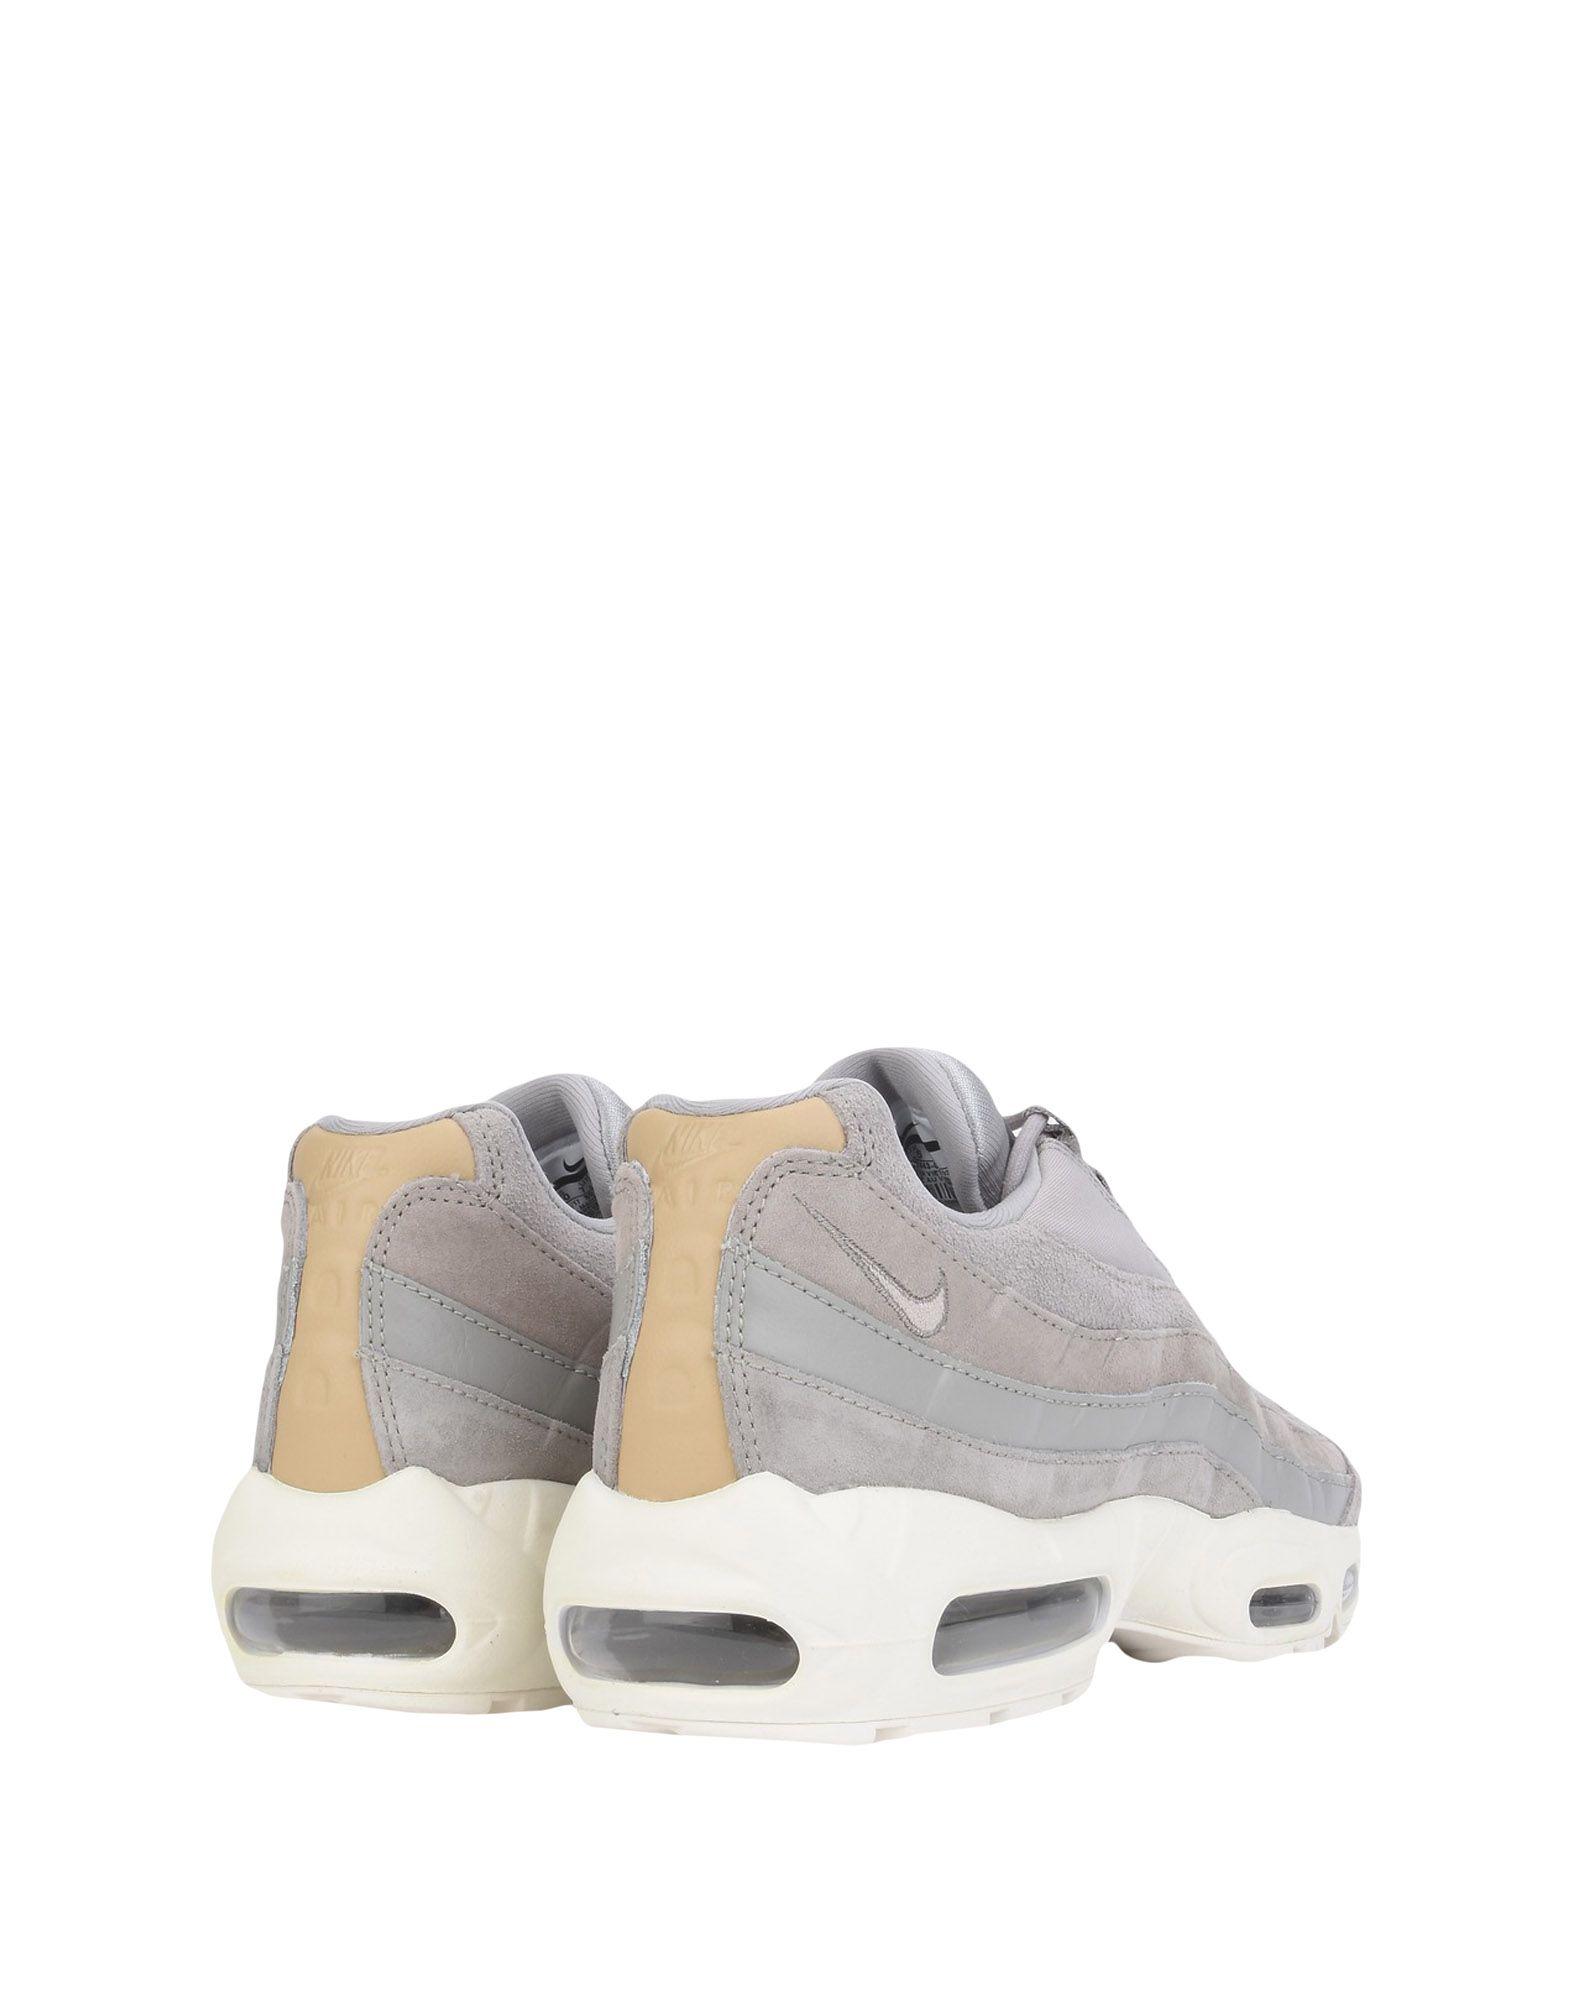 Sneakers Nike  Air Max 95 Premium - Femme - Sneakers Nike sur